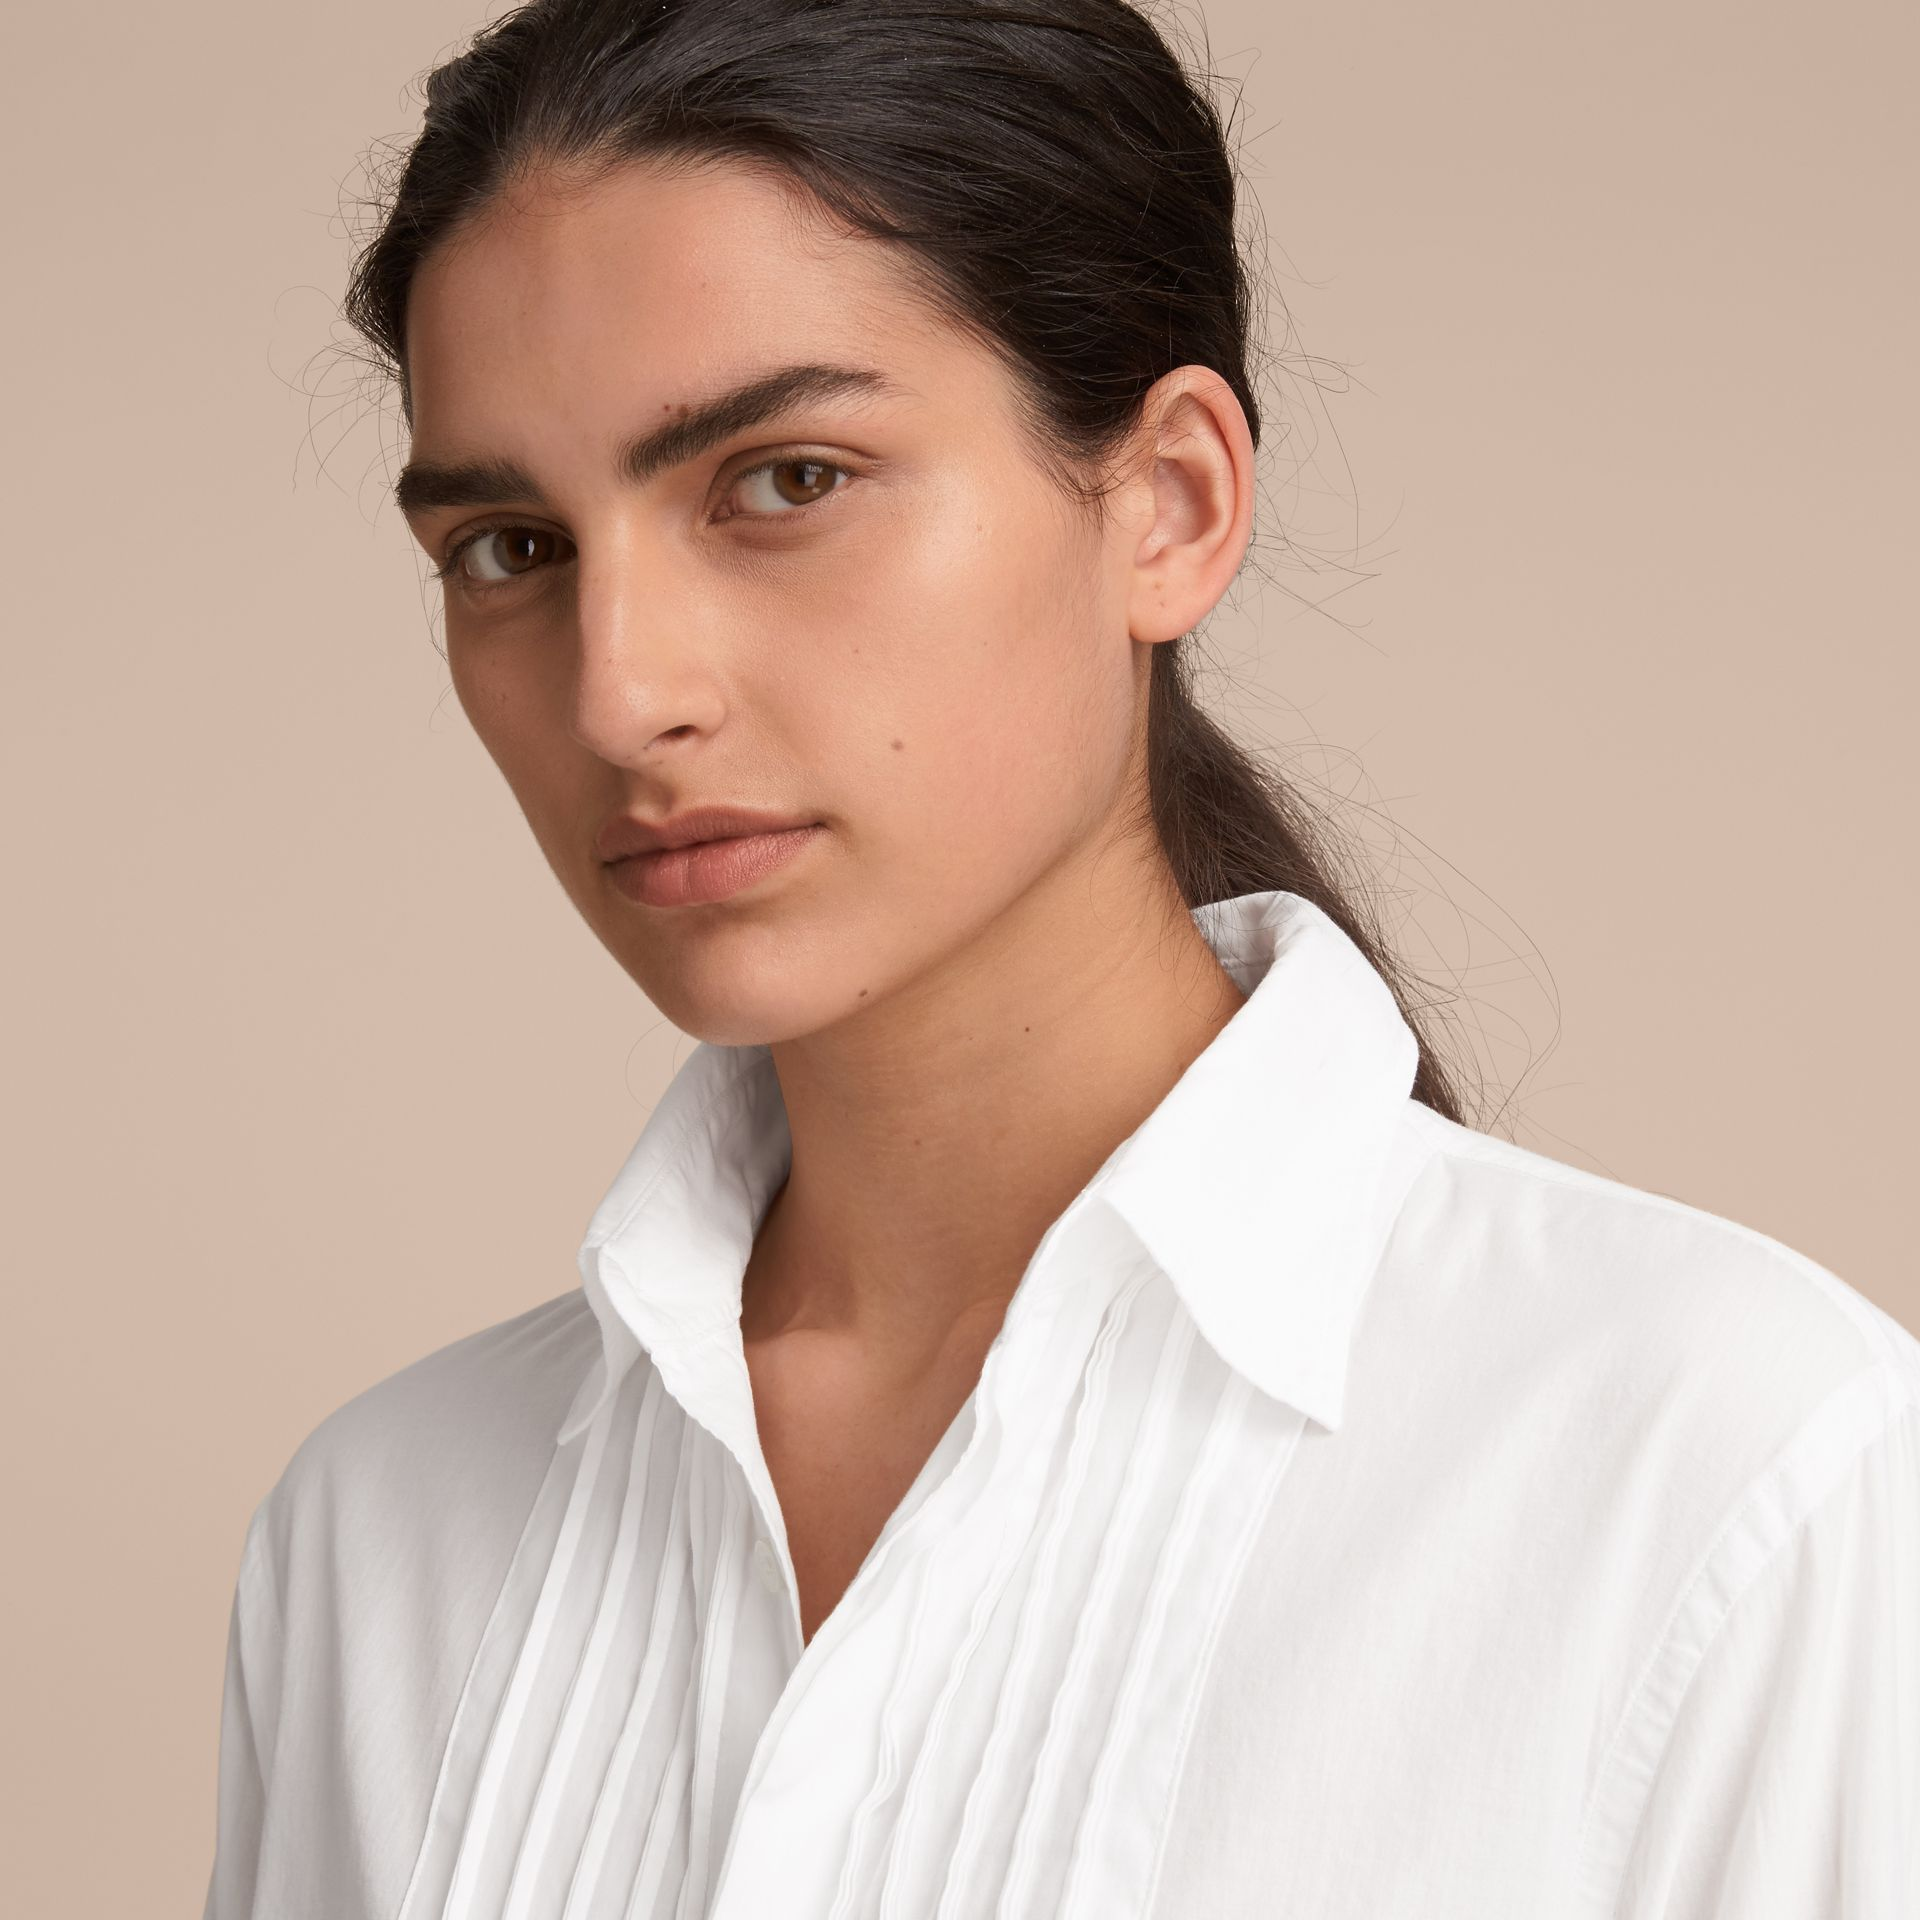 Unisex Double-cuff Pintuck Bib Cotton Shirt White - gallery image 5